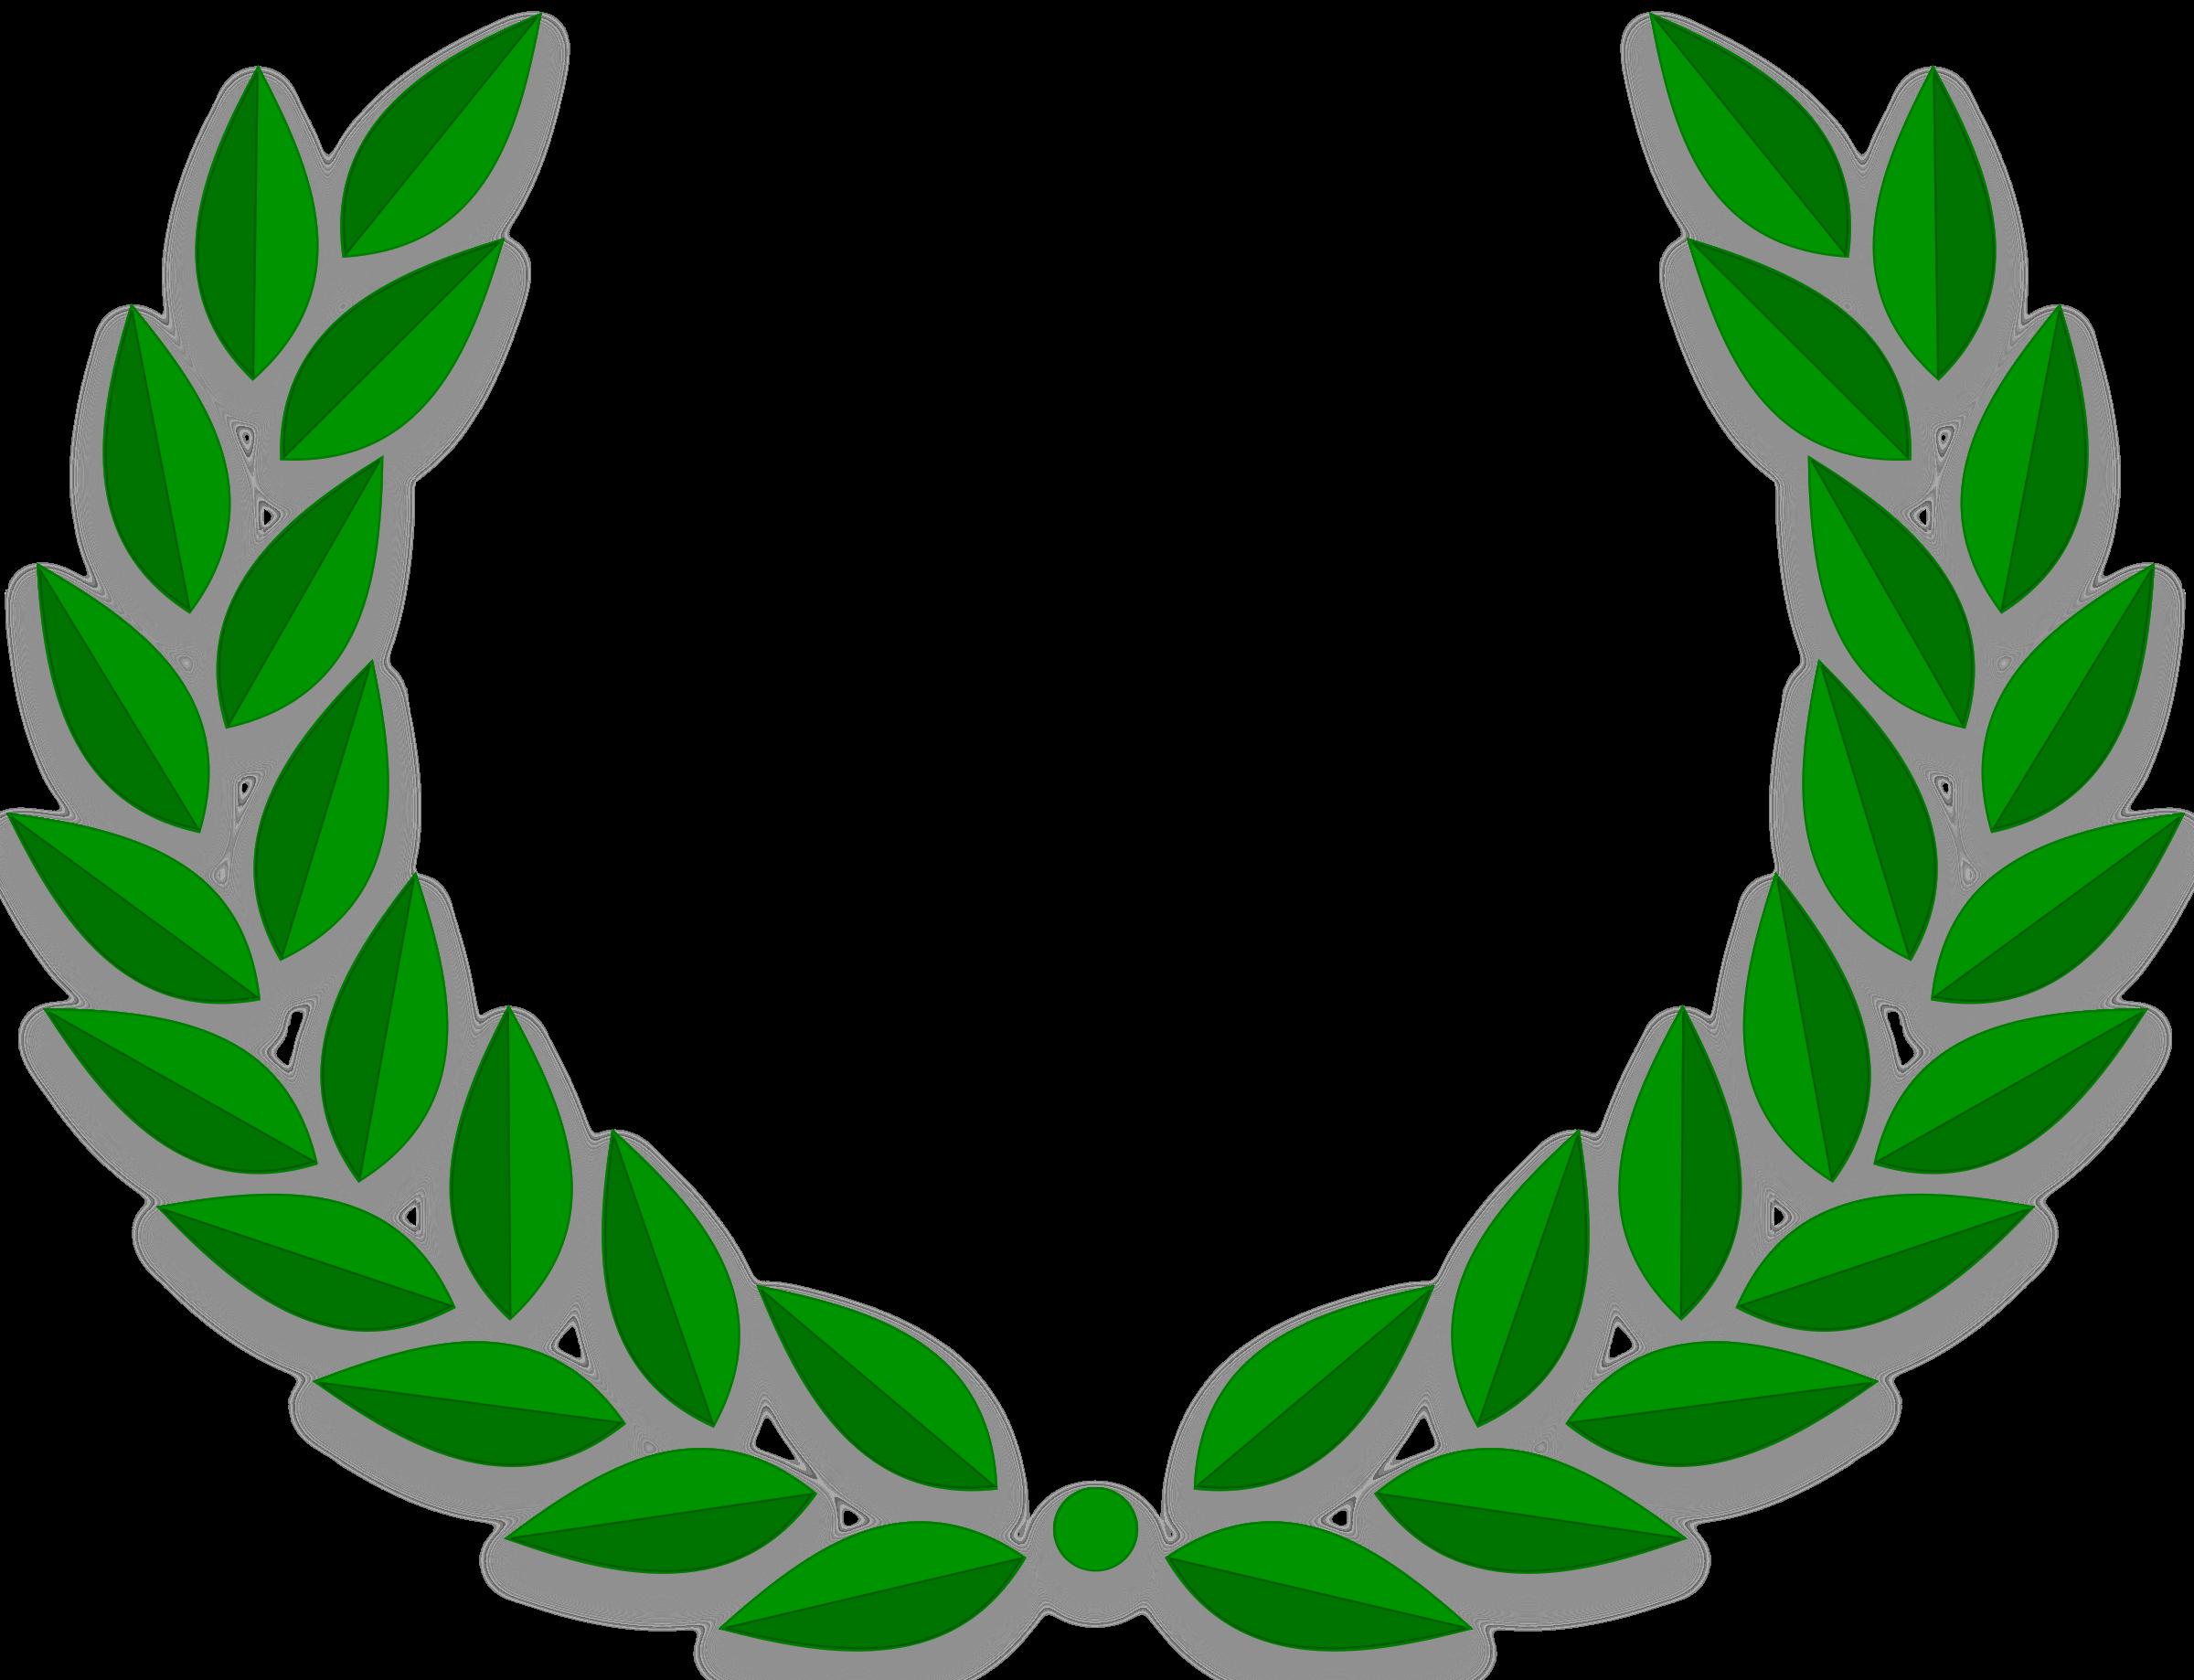 jpg transparent Wreath big image png. Laurel clipart olympic.